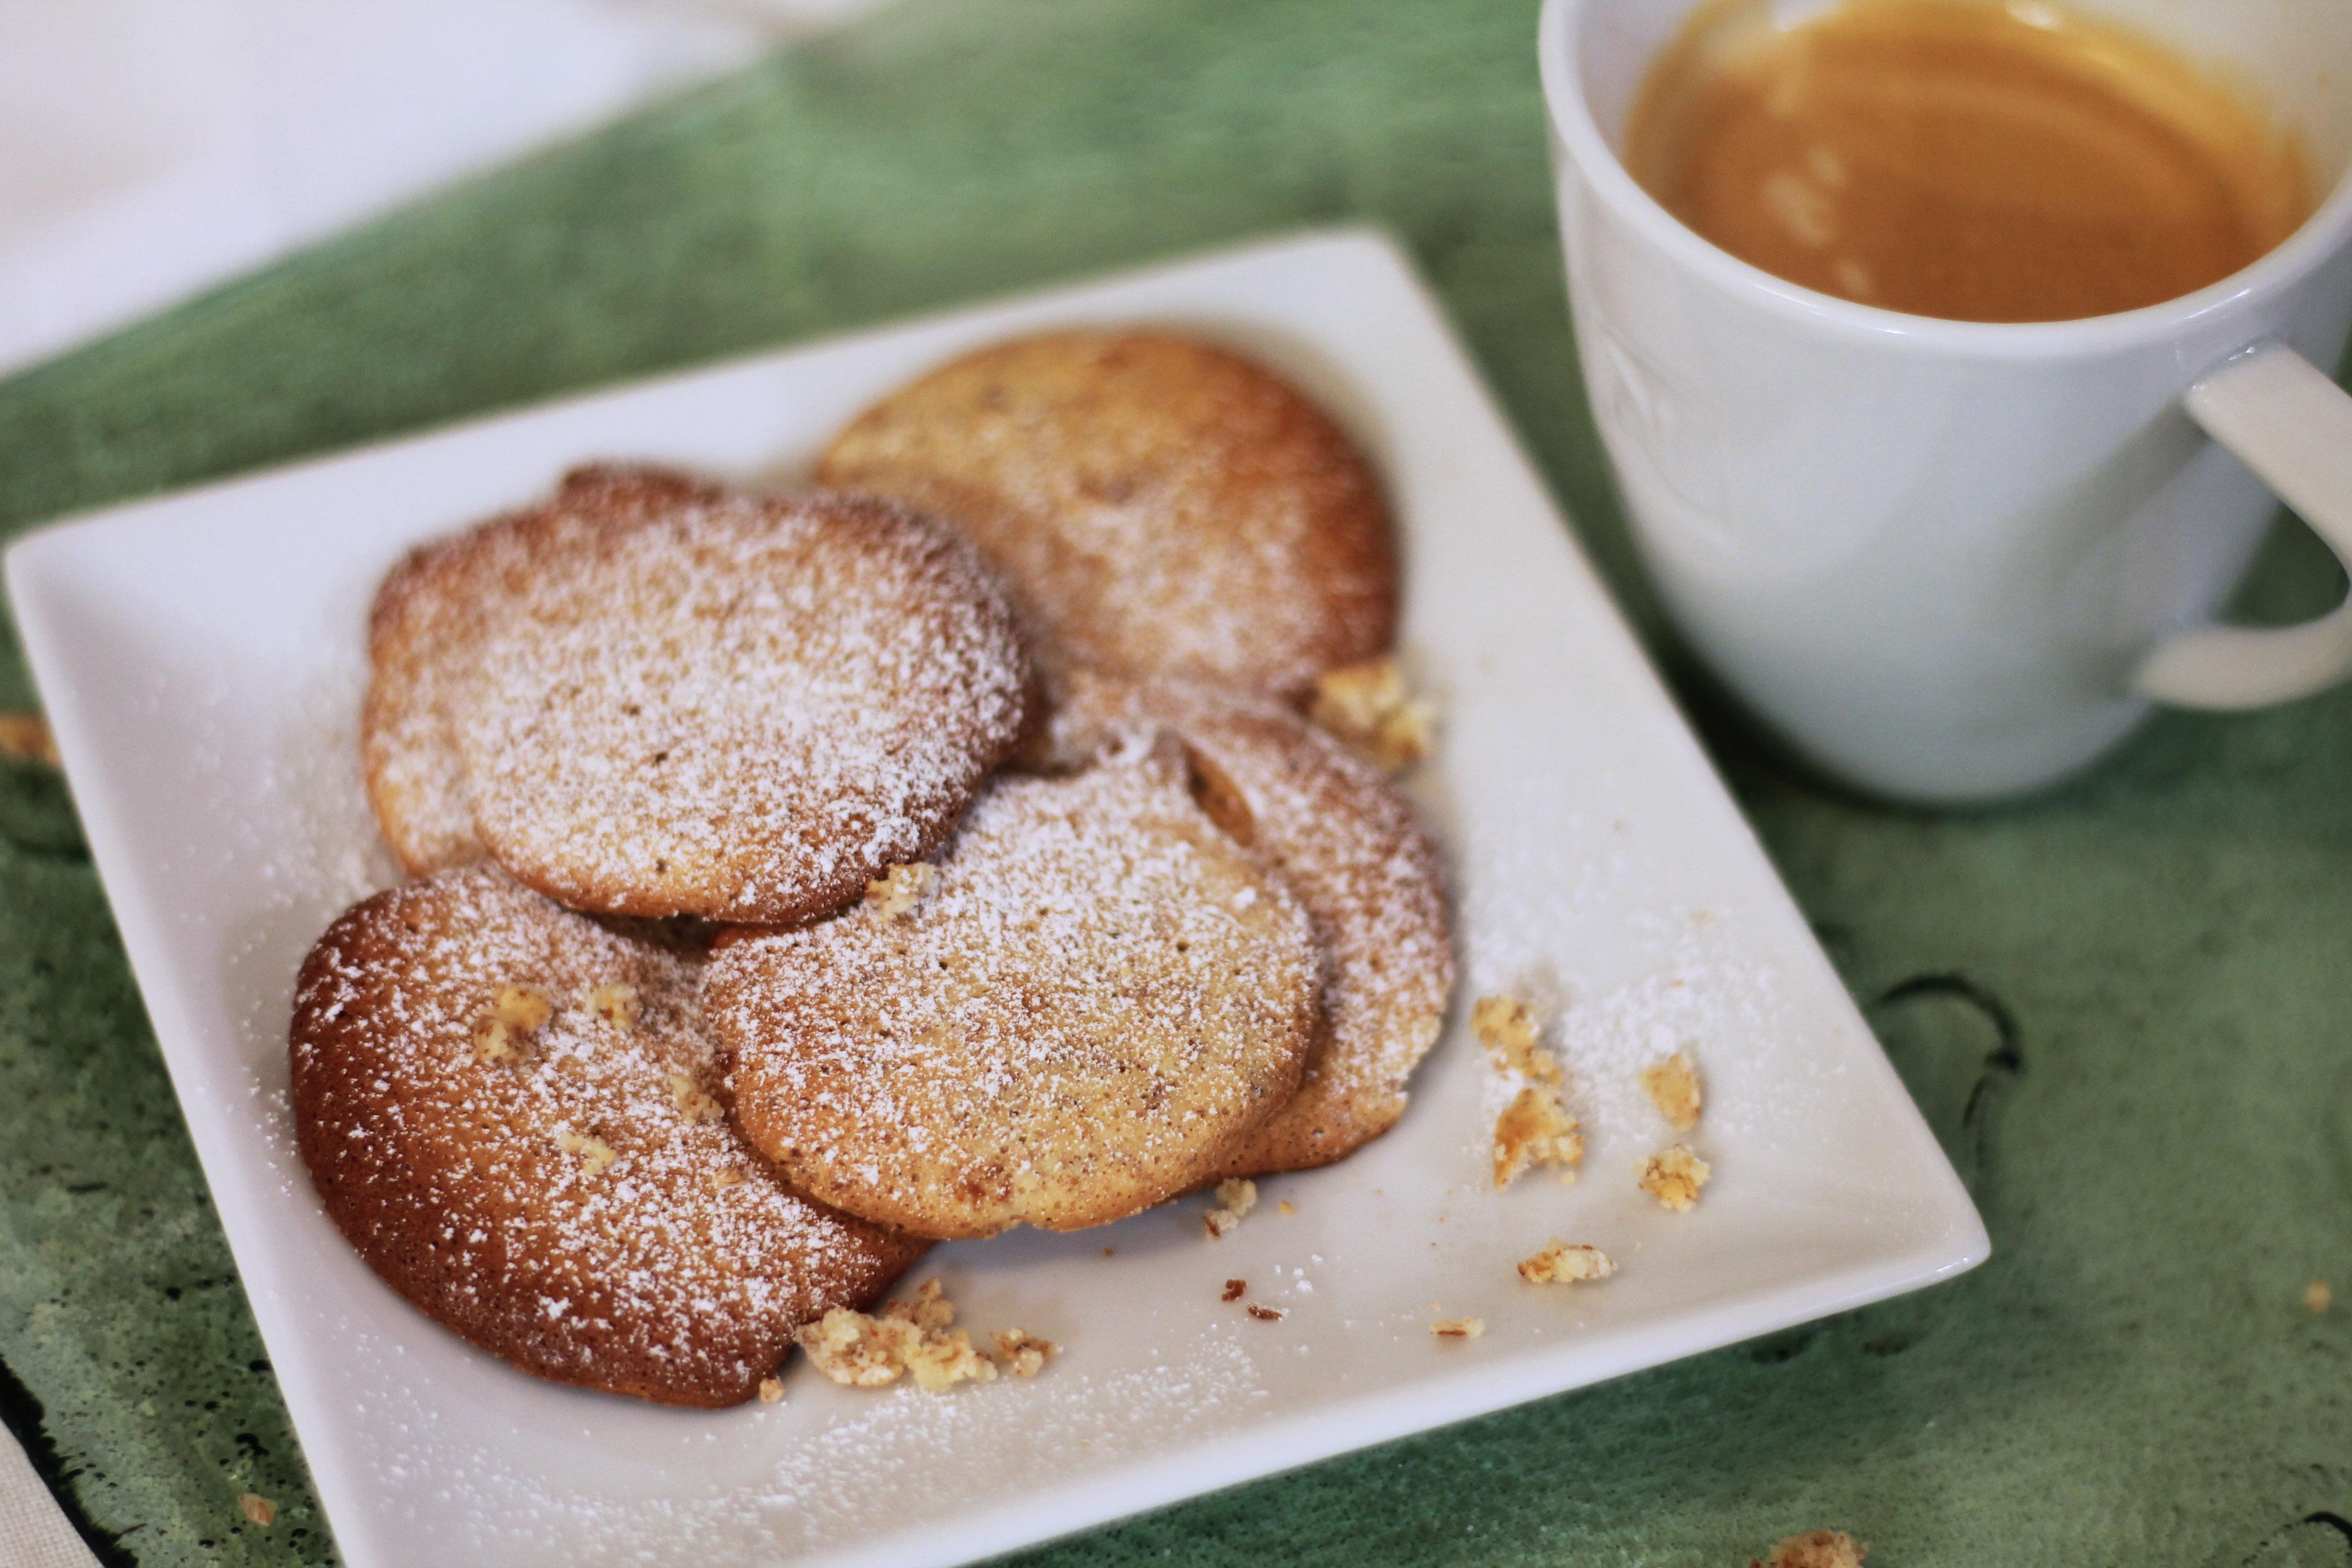 7-geschmackswelten-food-blogparade-italien-kulinarische-momente-italia-italy-rezept-gericht-kardiaserena-amaretti